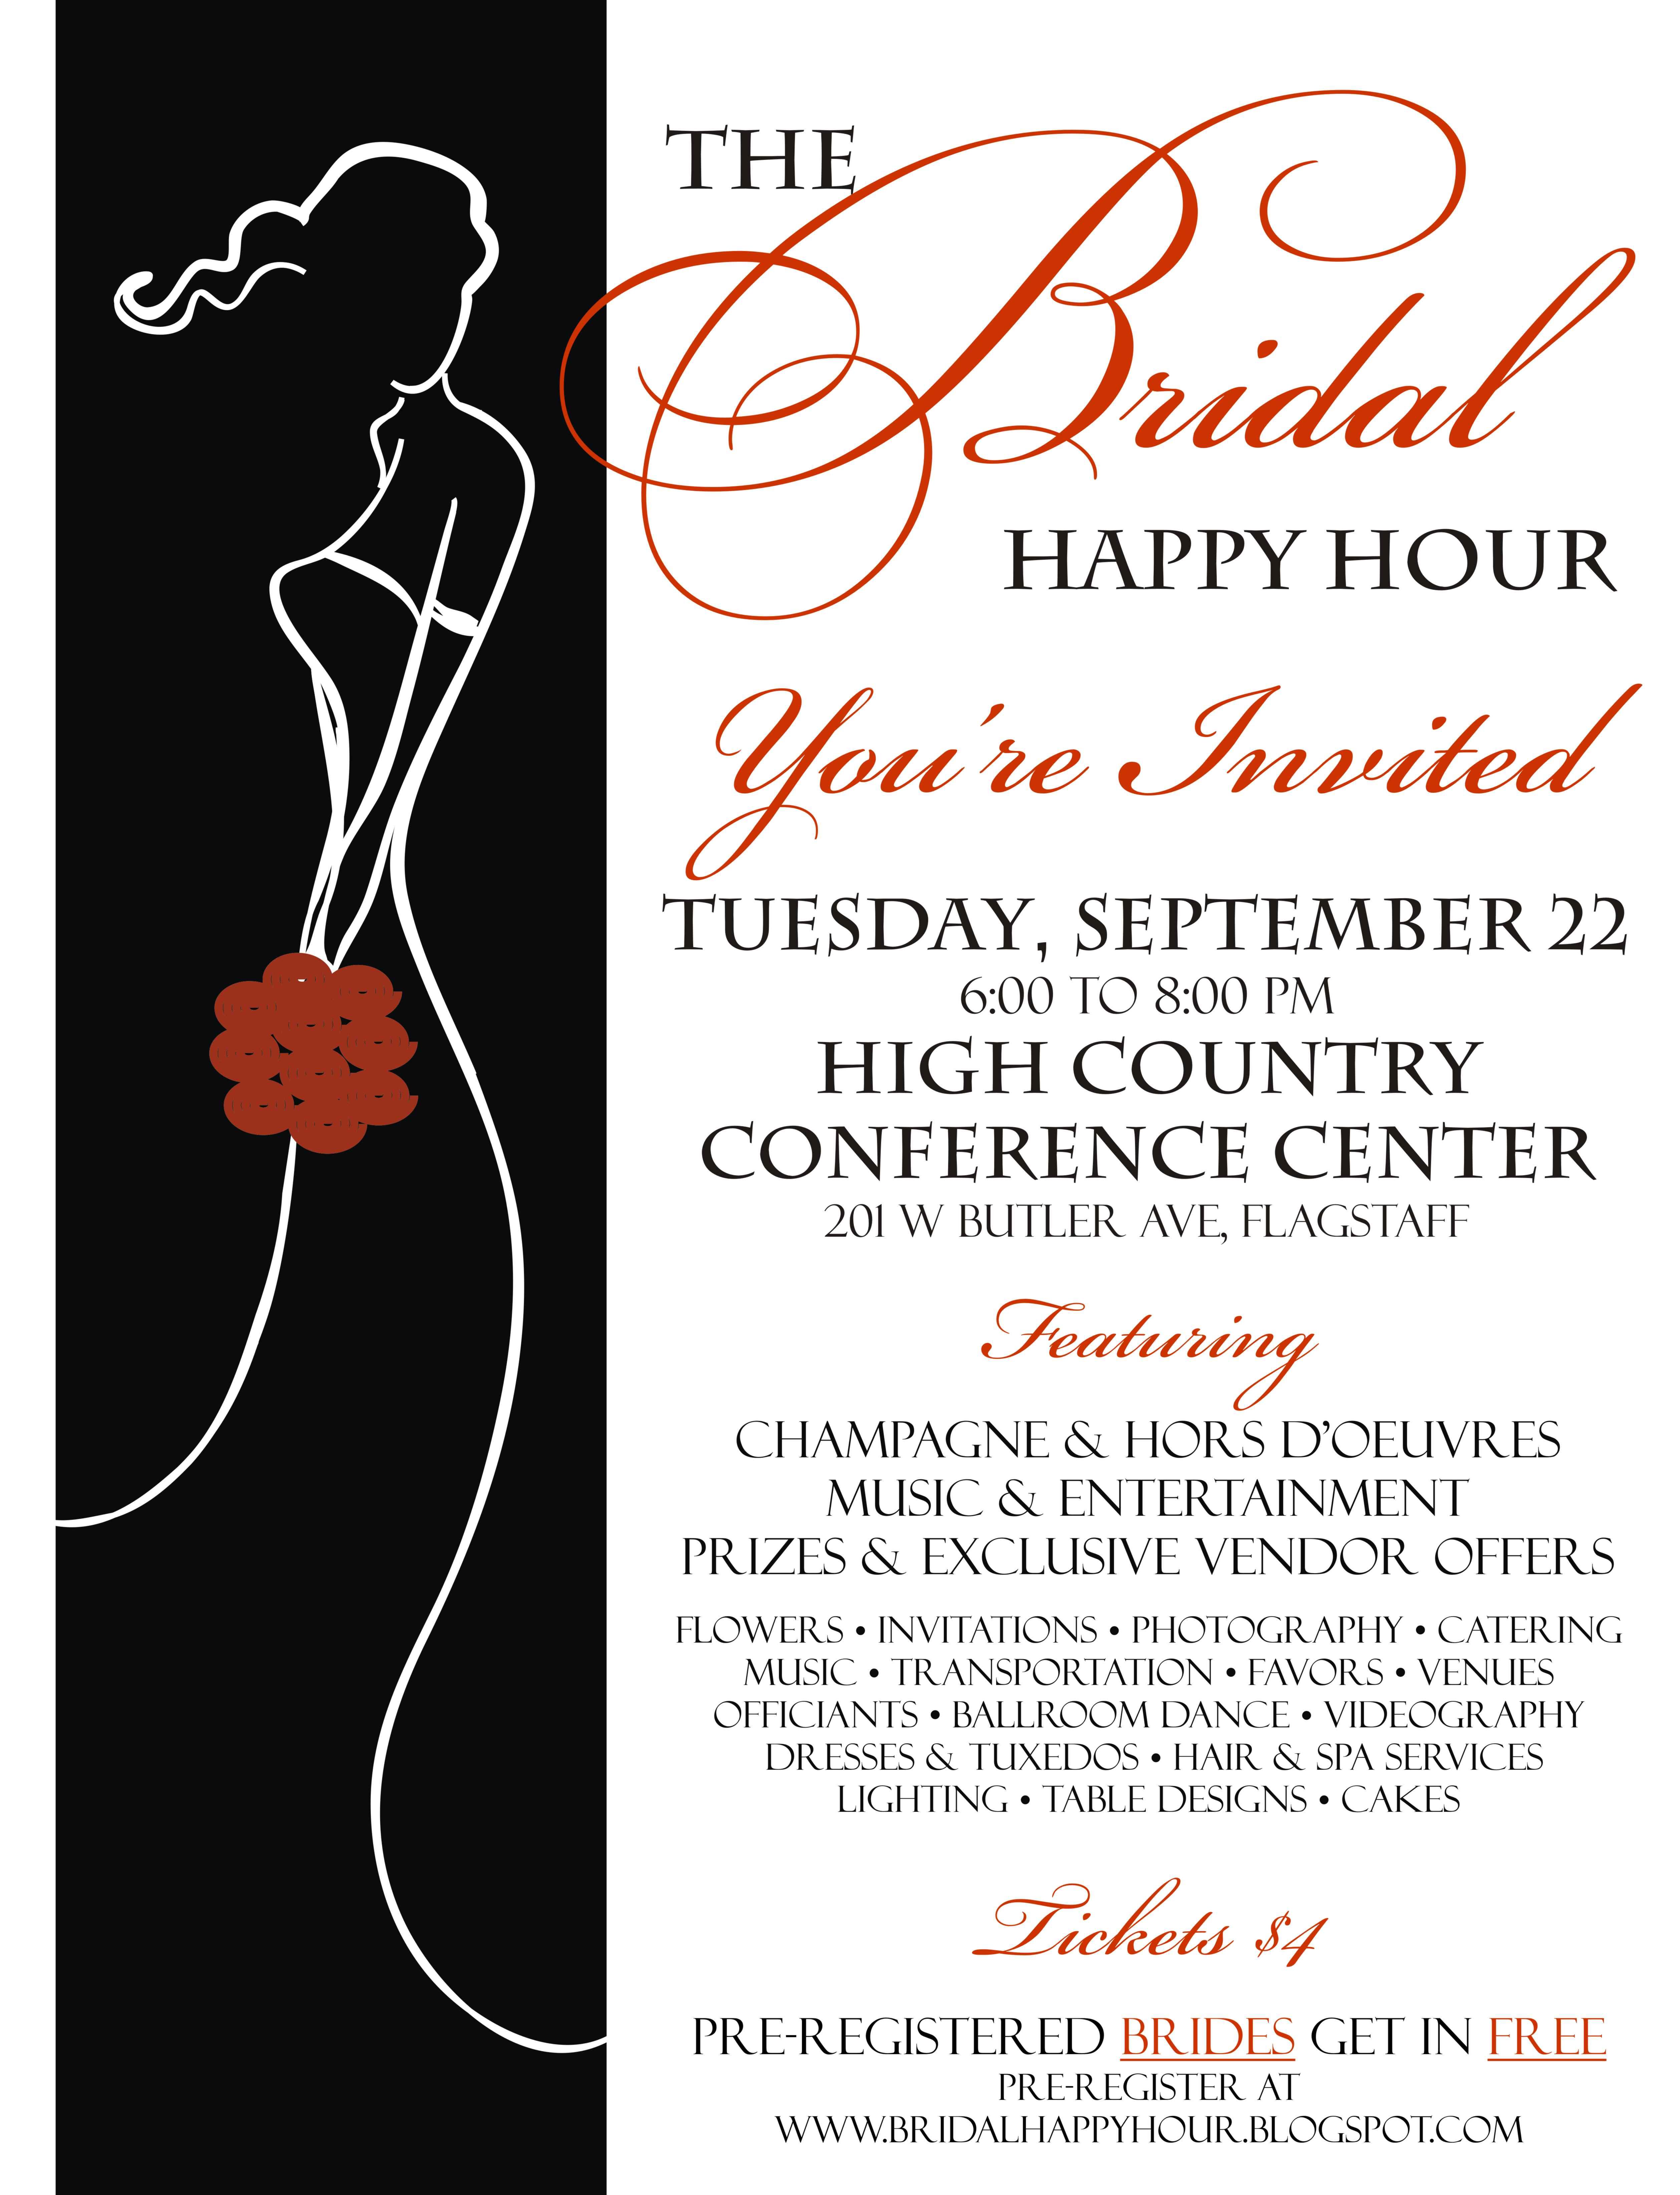 about memories more bridal ideas bridal happy hour flyer